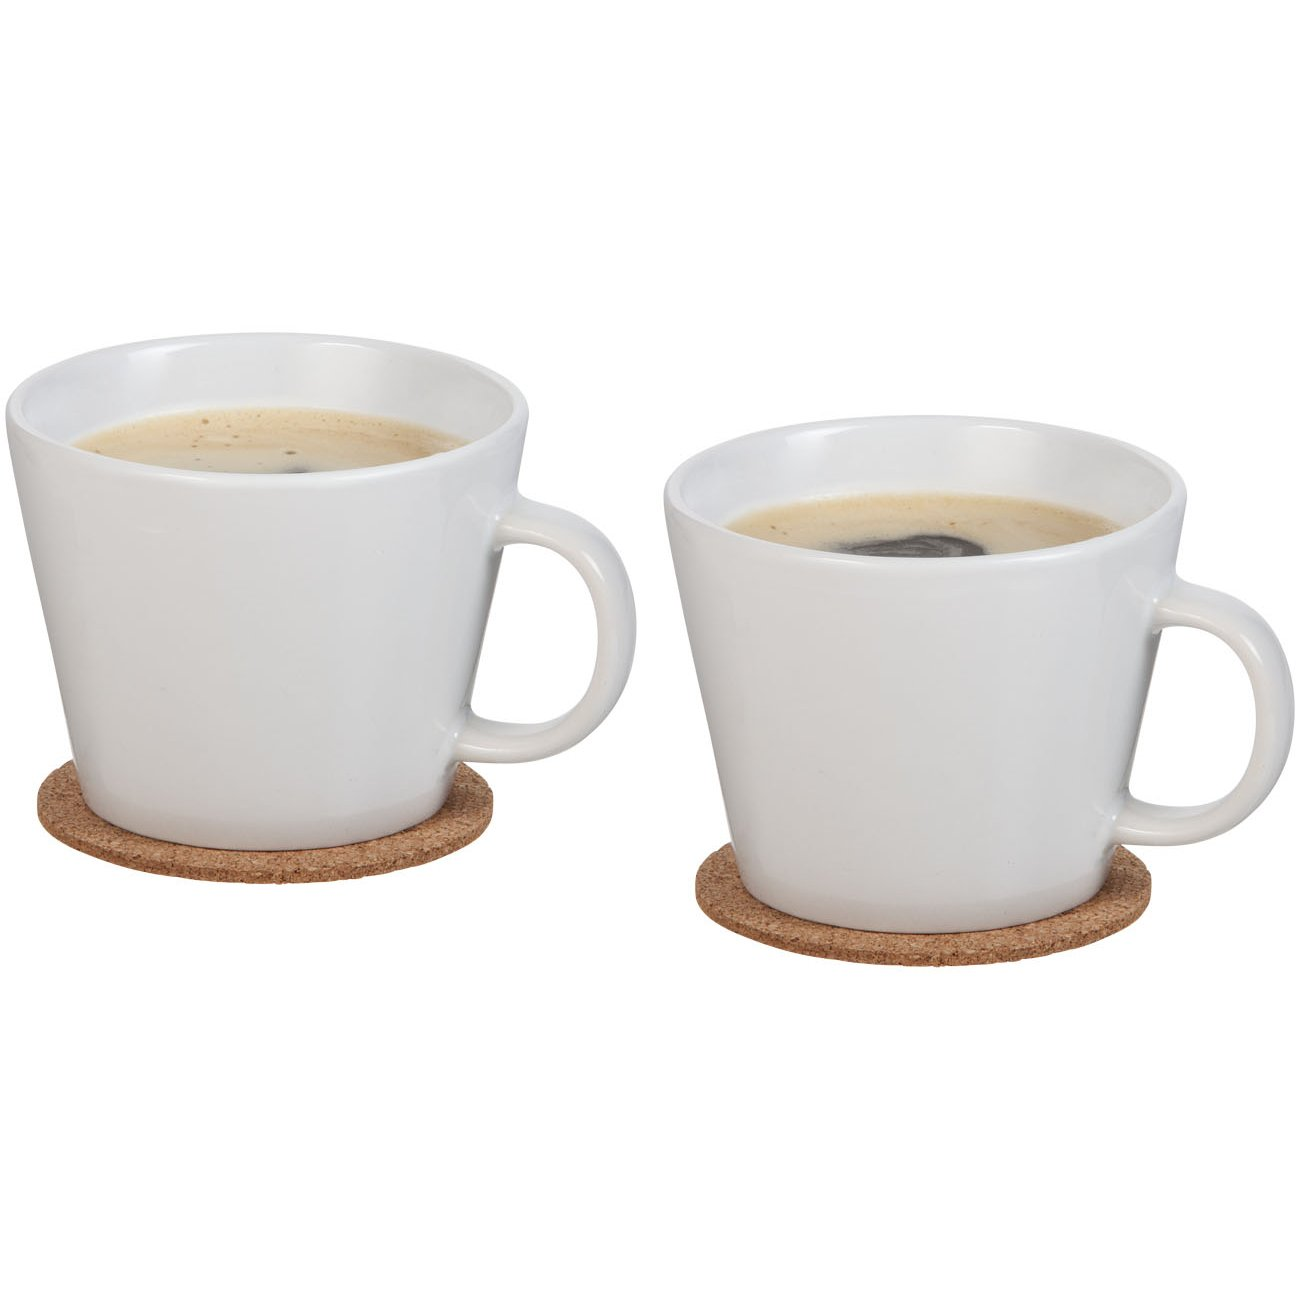 Seasons Hartley 2 piece mug set with coaster